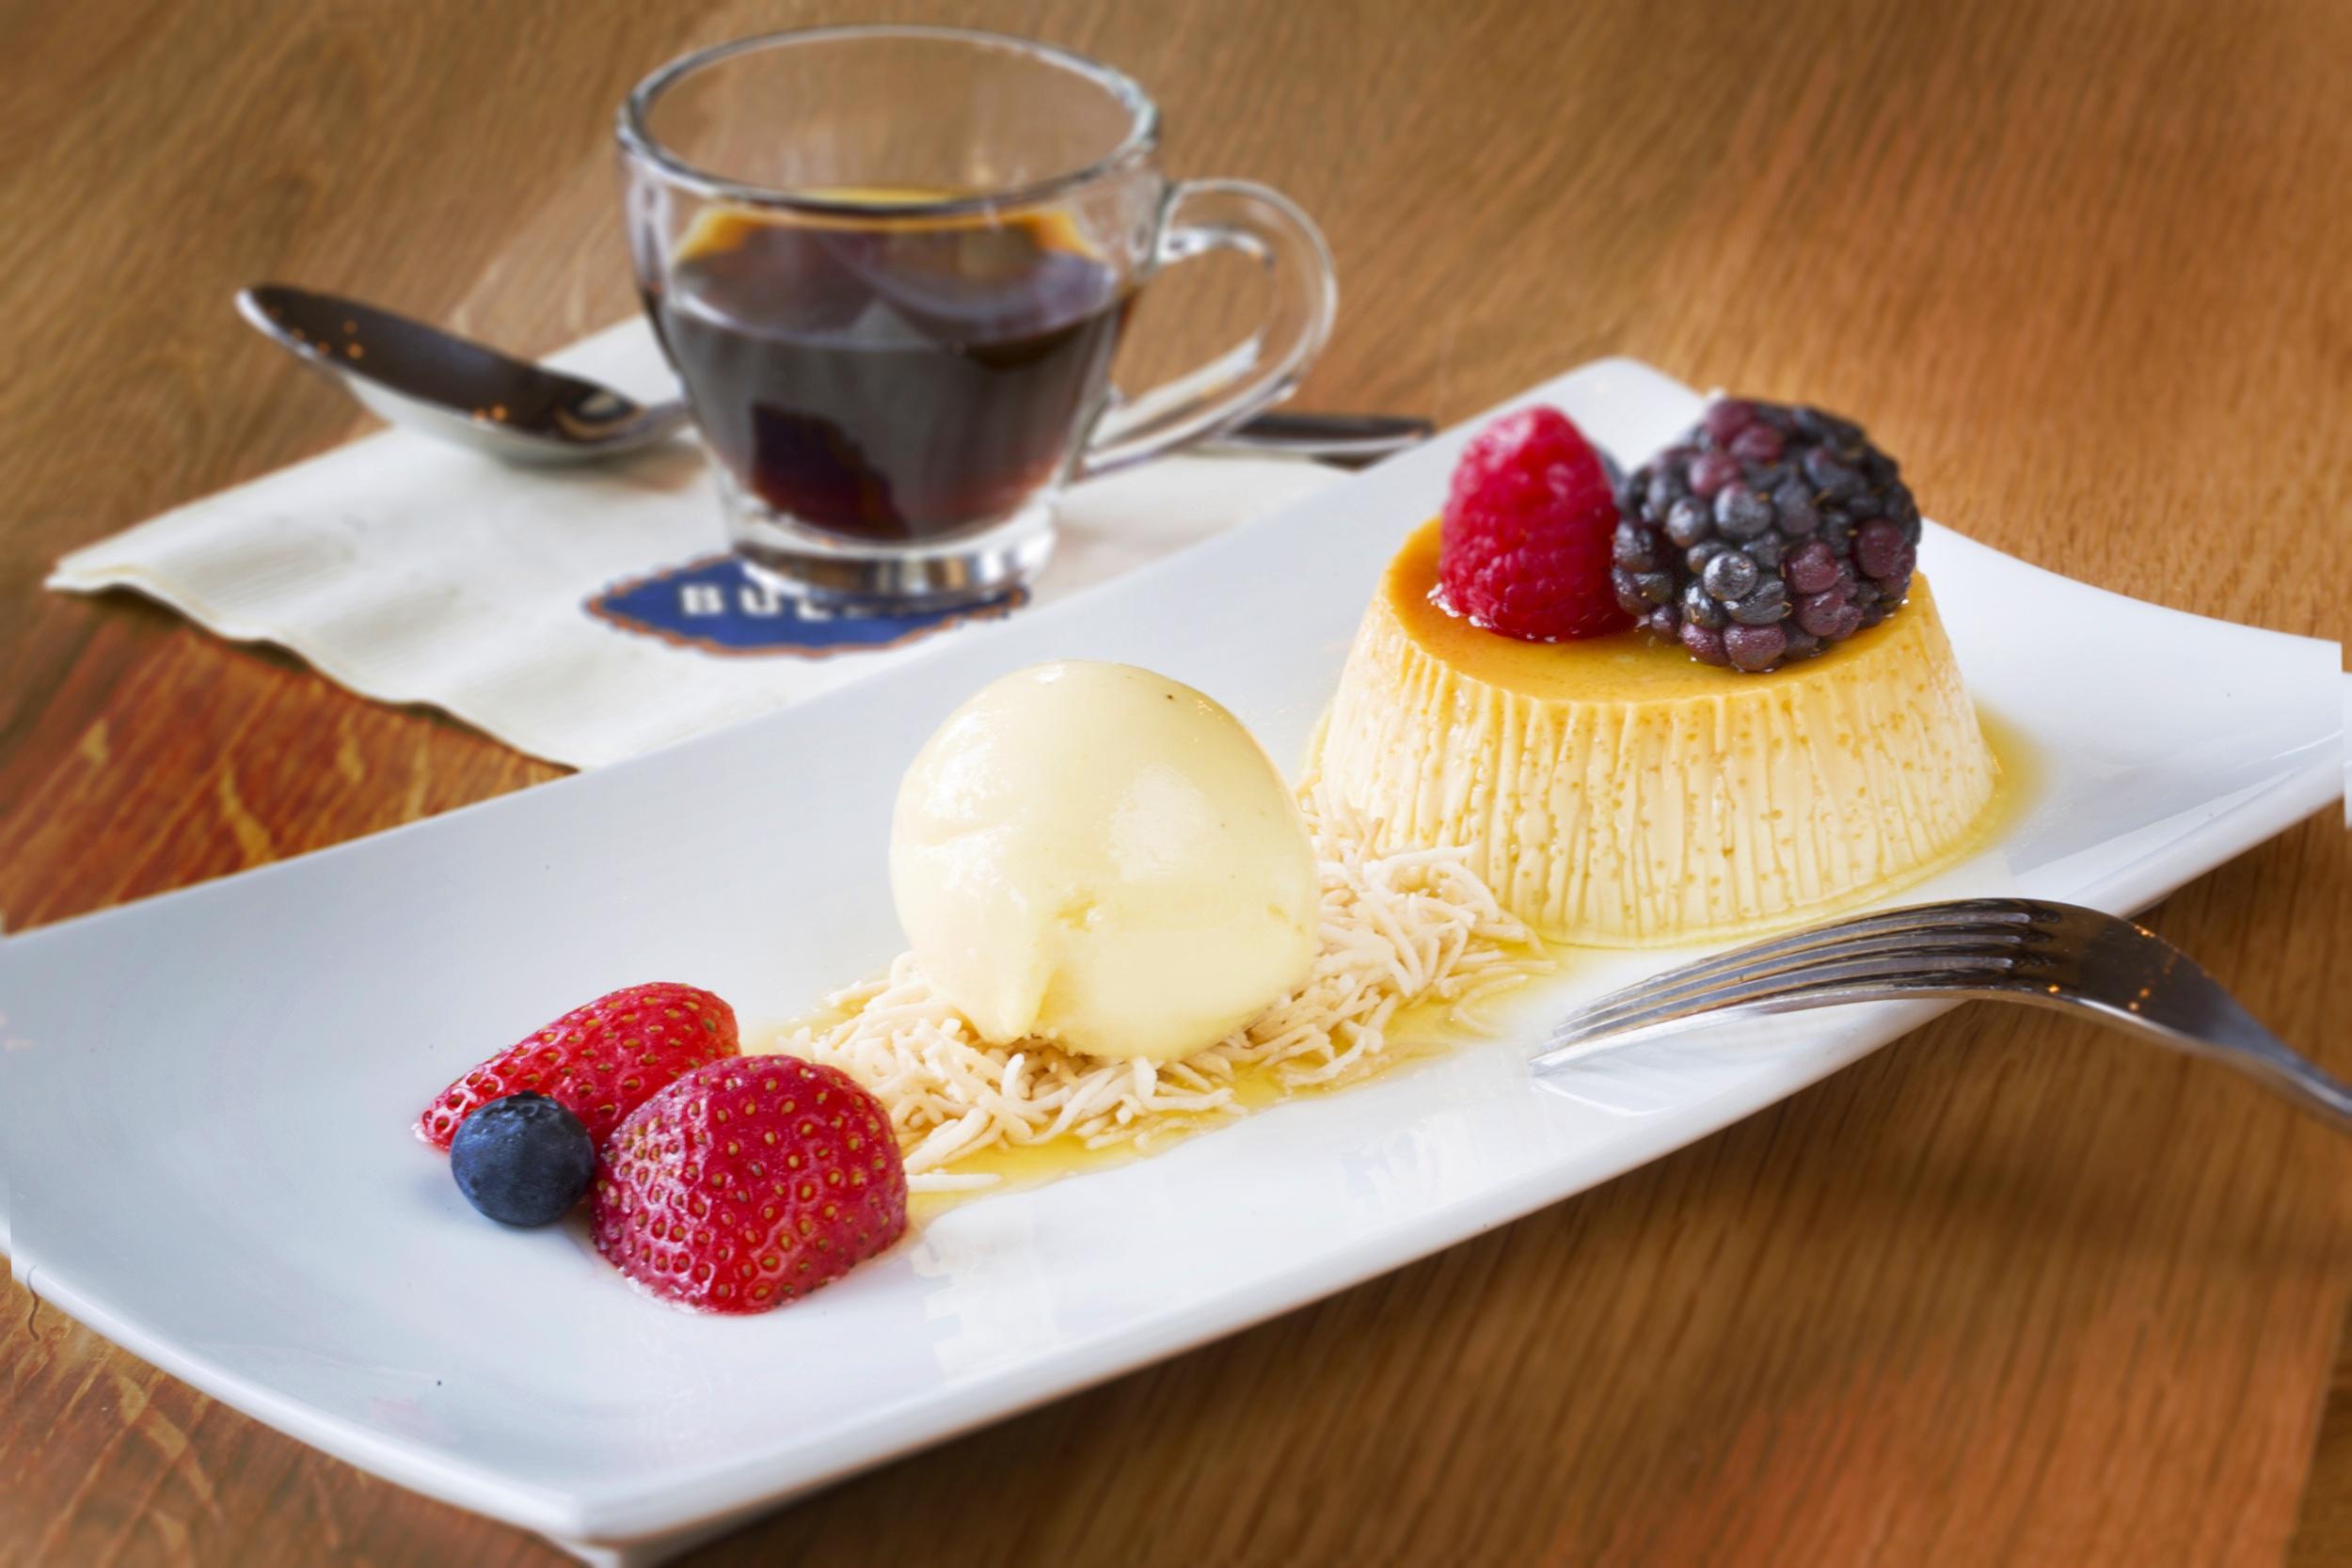 FLAN+DE+COCO+Coconut+flan%2C+passion+fruit+sorbet-17.jpg